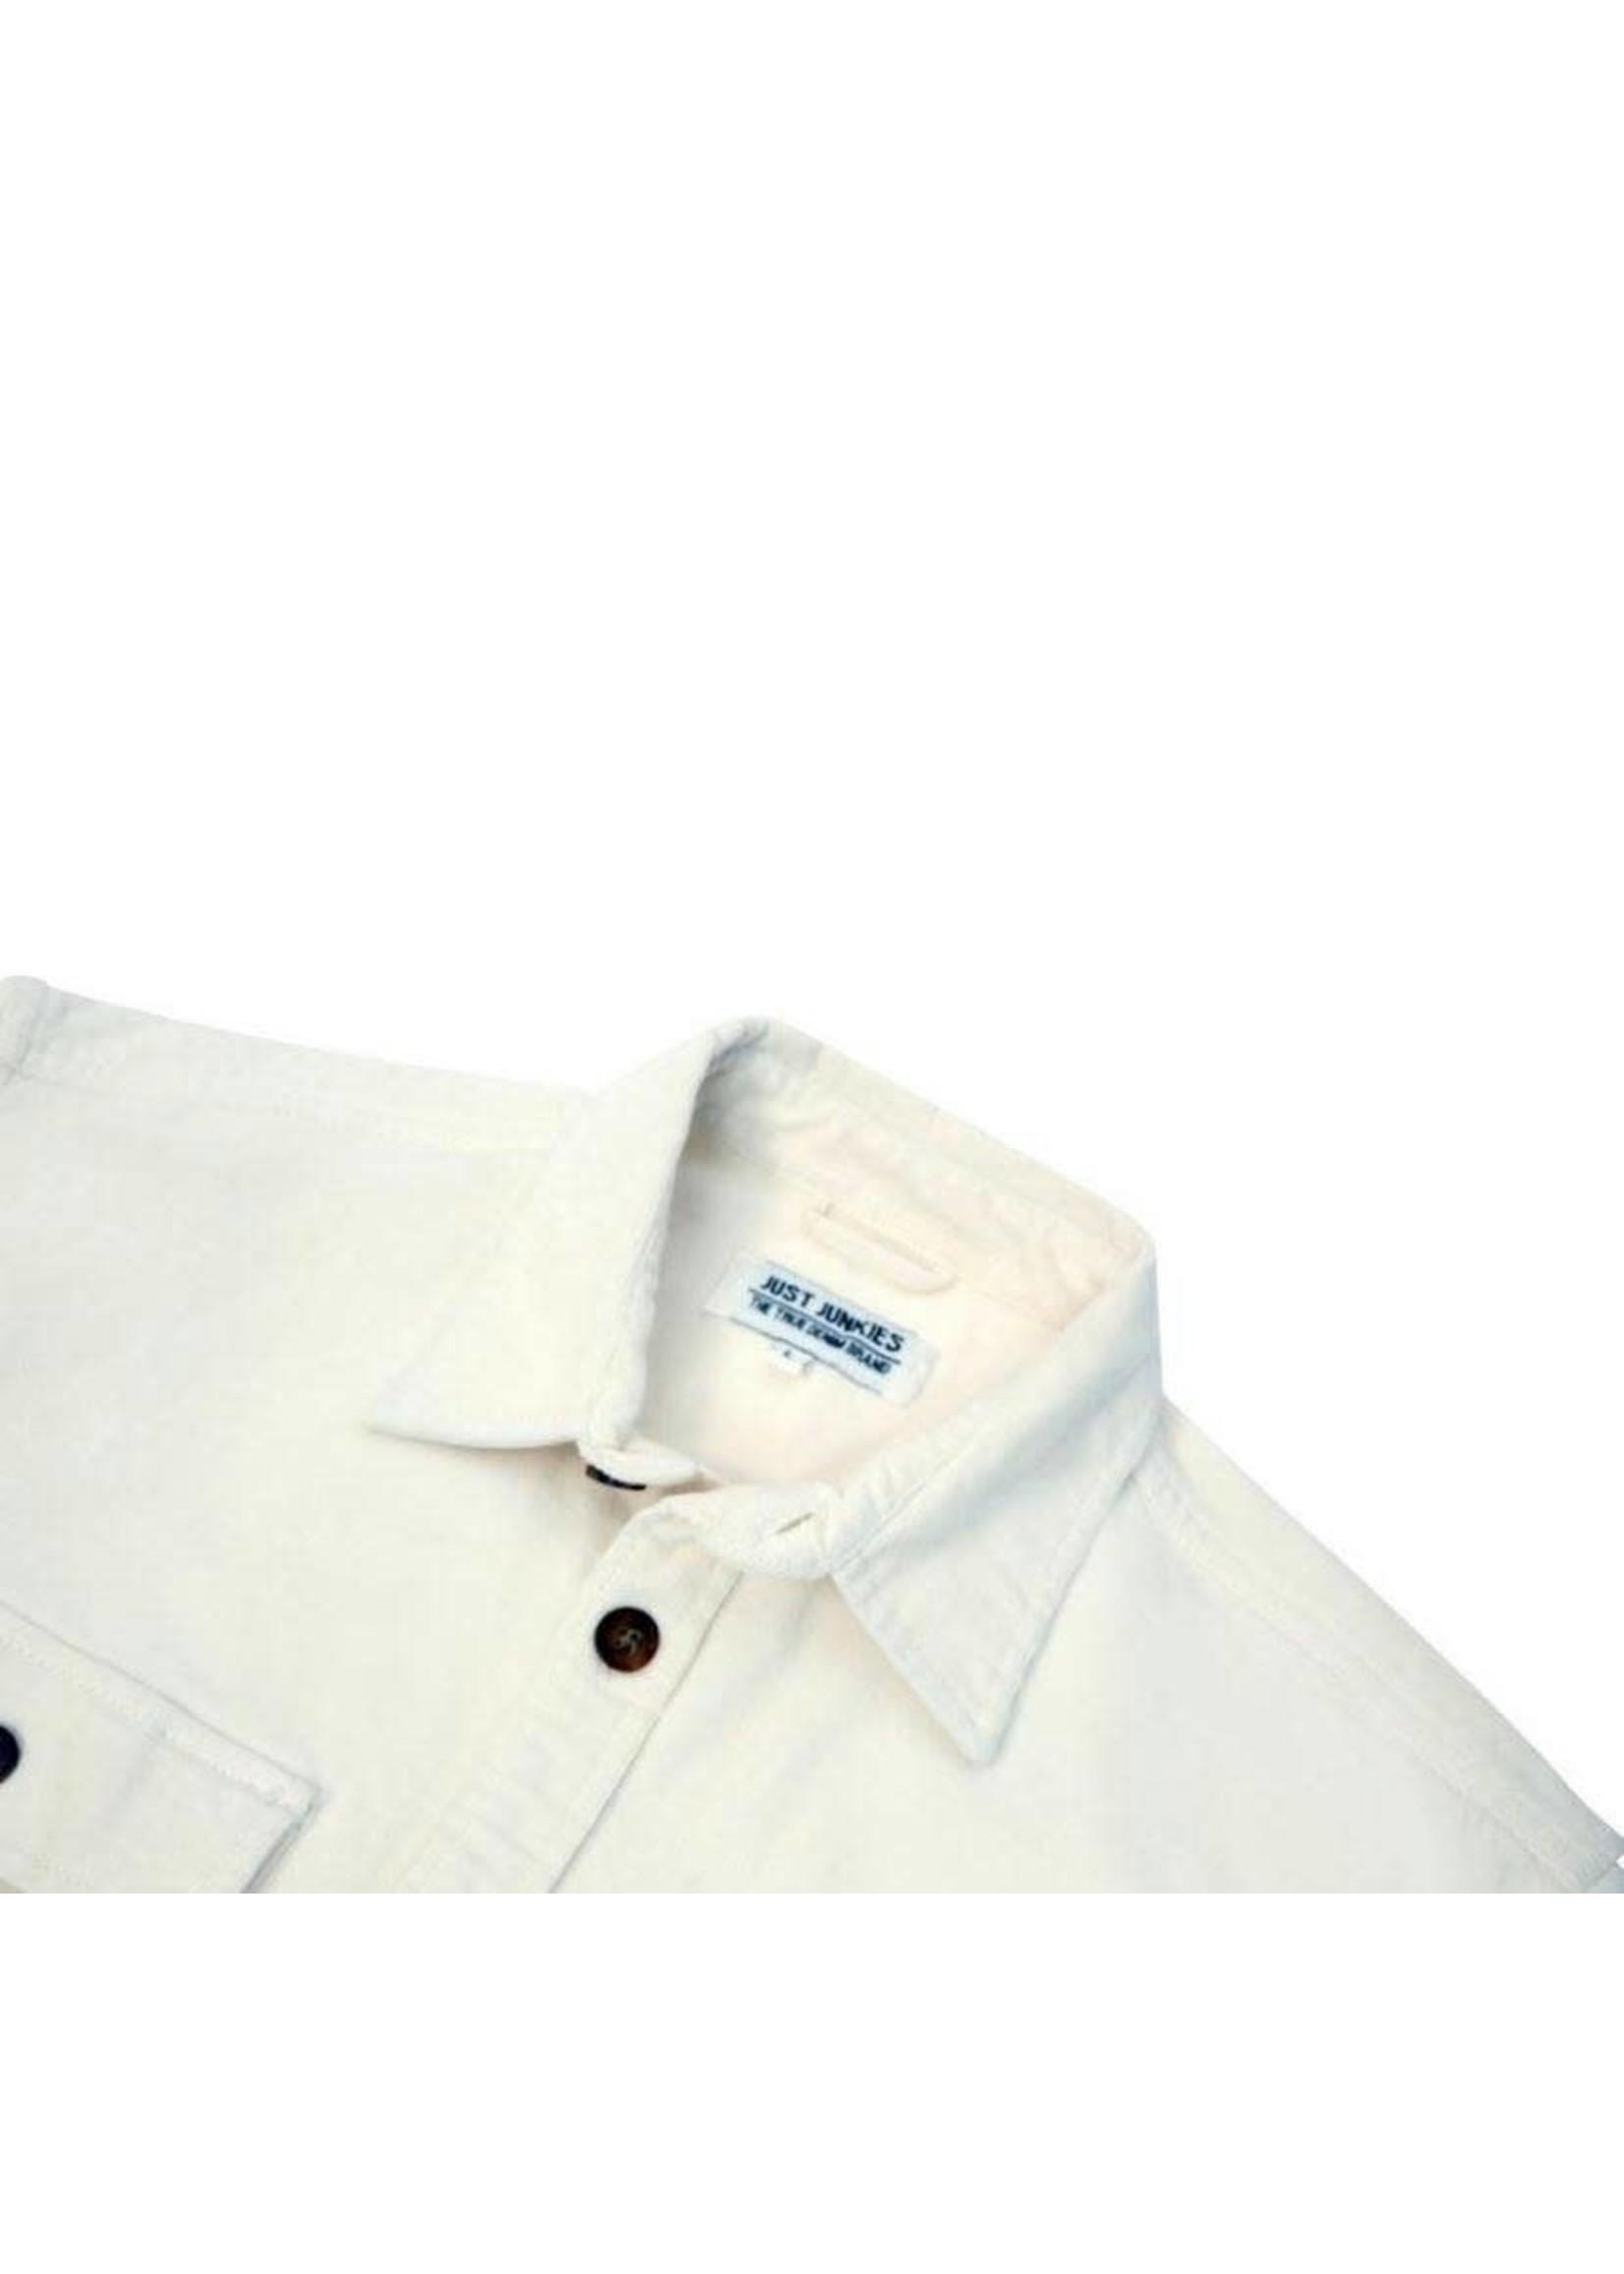 Just Junkies JUST JUNKIES | Haza Overshirt - Off White